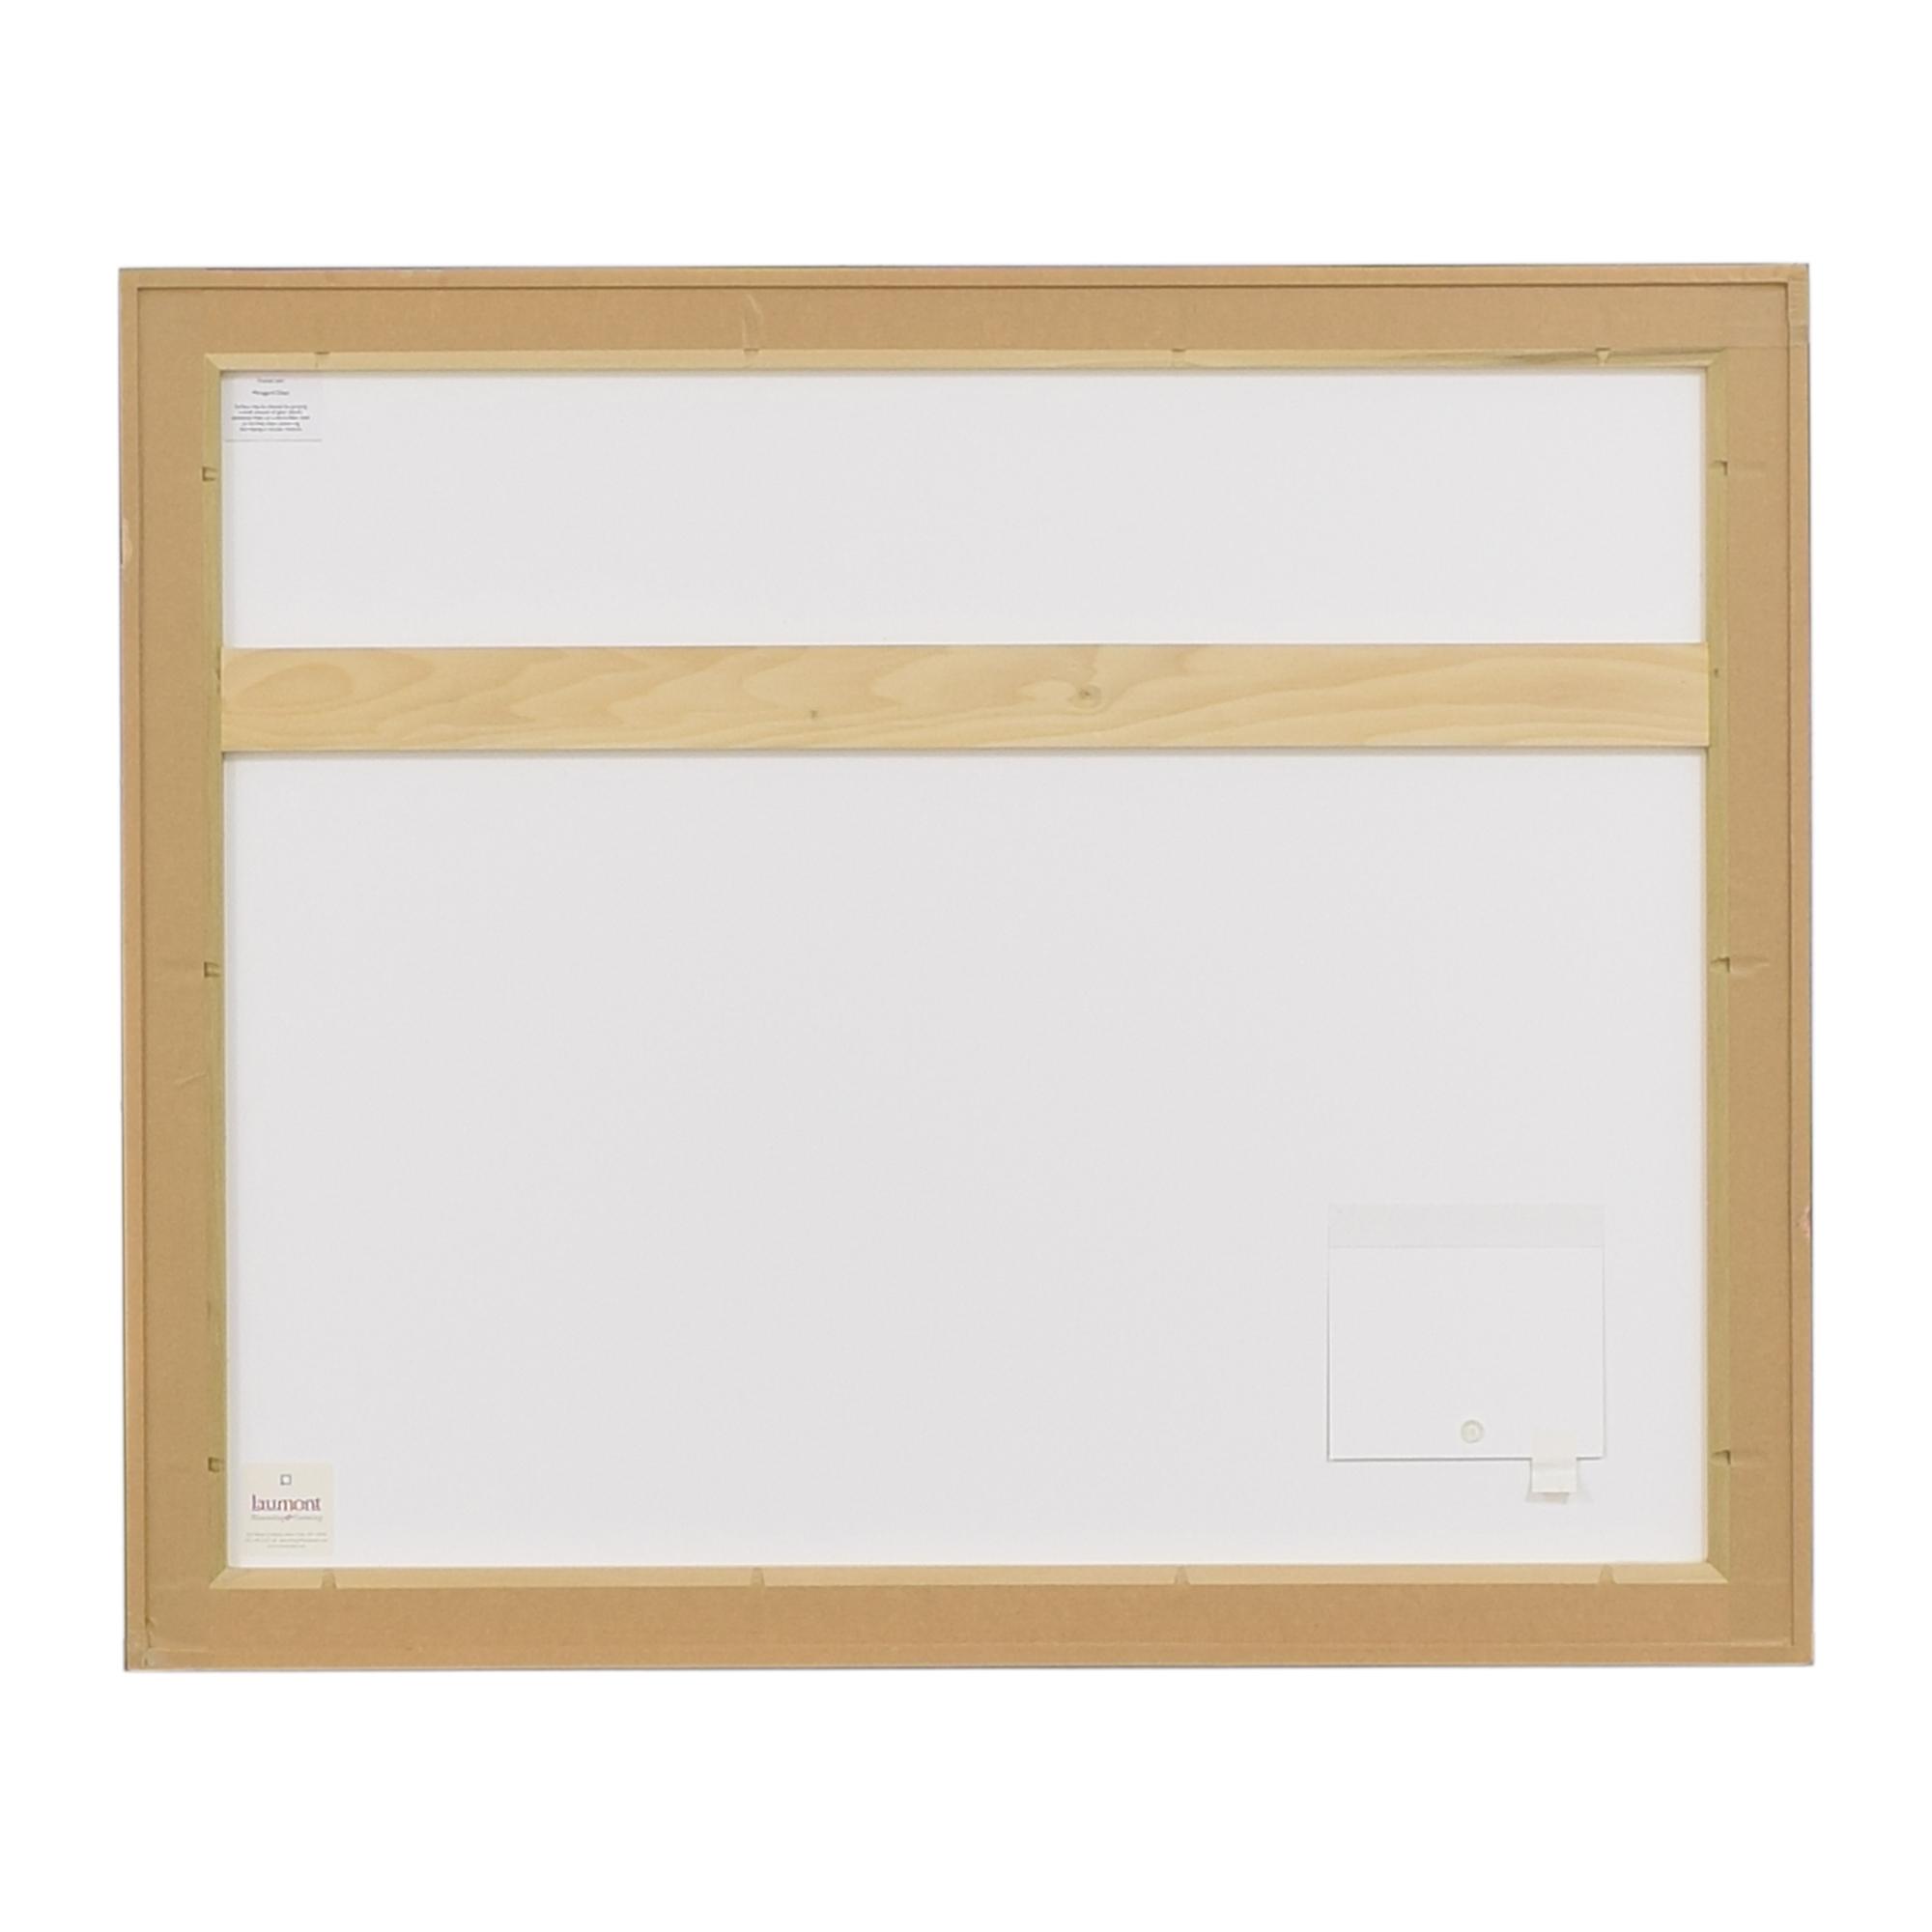 Koi Fish Framed Wall Art dimensions